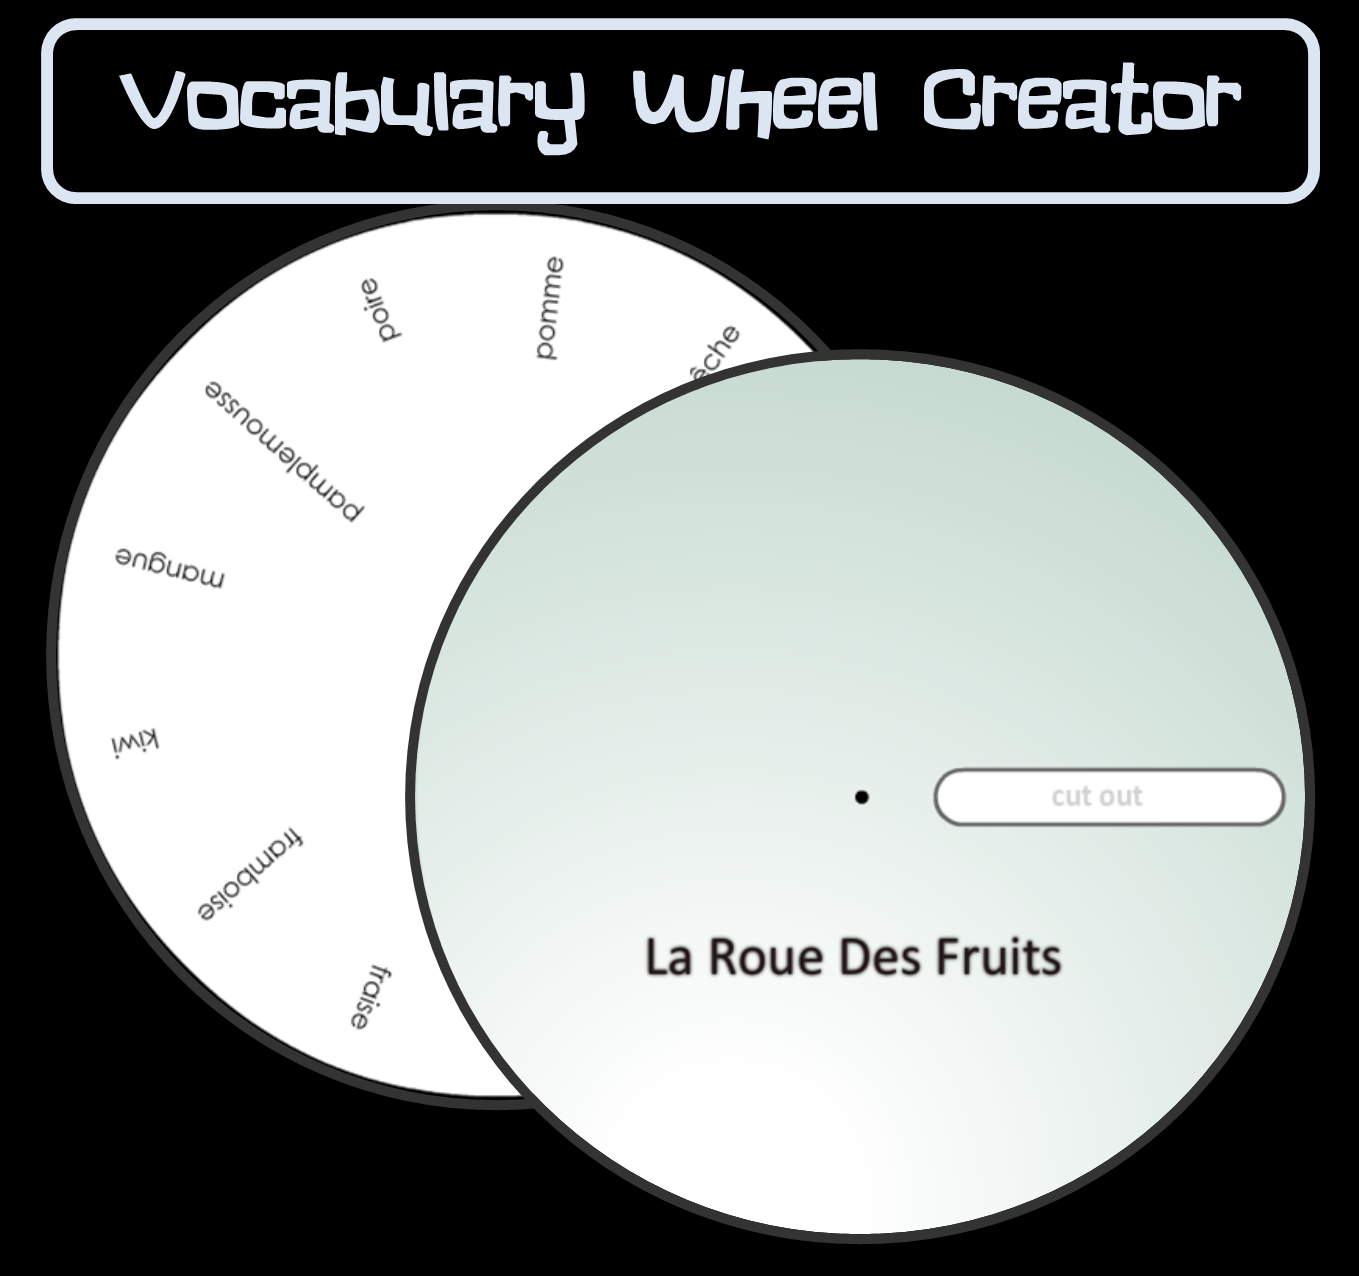 Vocabulary Wheel Creator